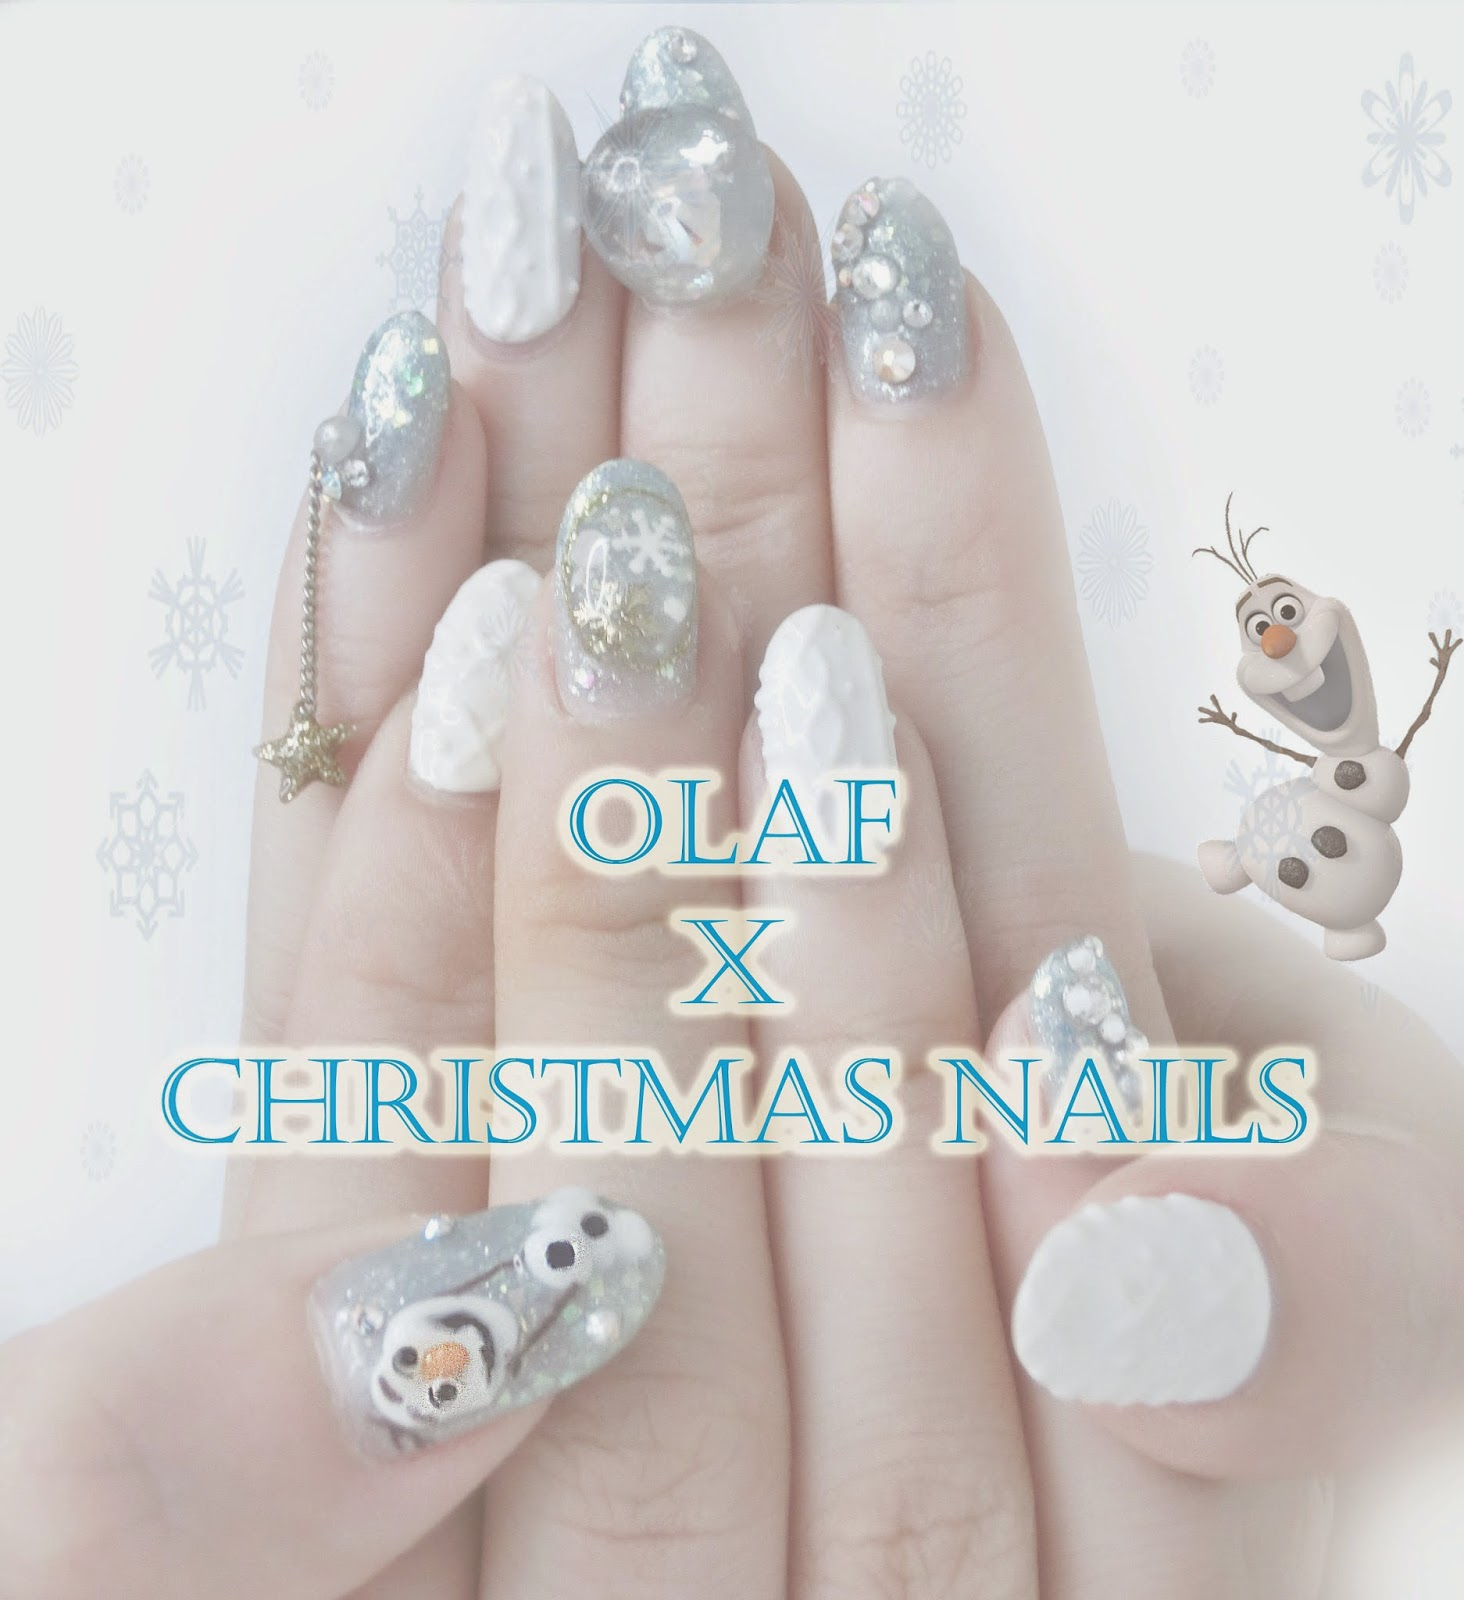 Nails] OLAF x Christmas Nails by ShiningNails - Golly-Locks